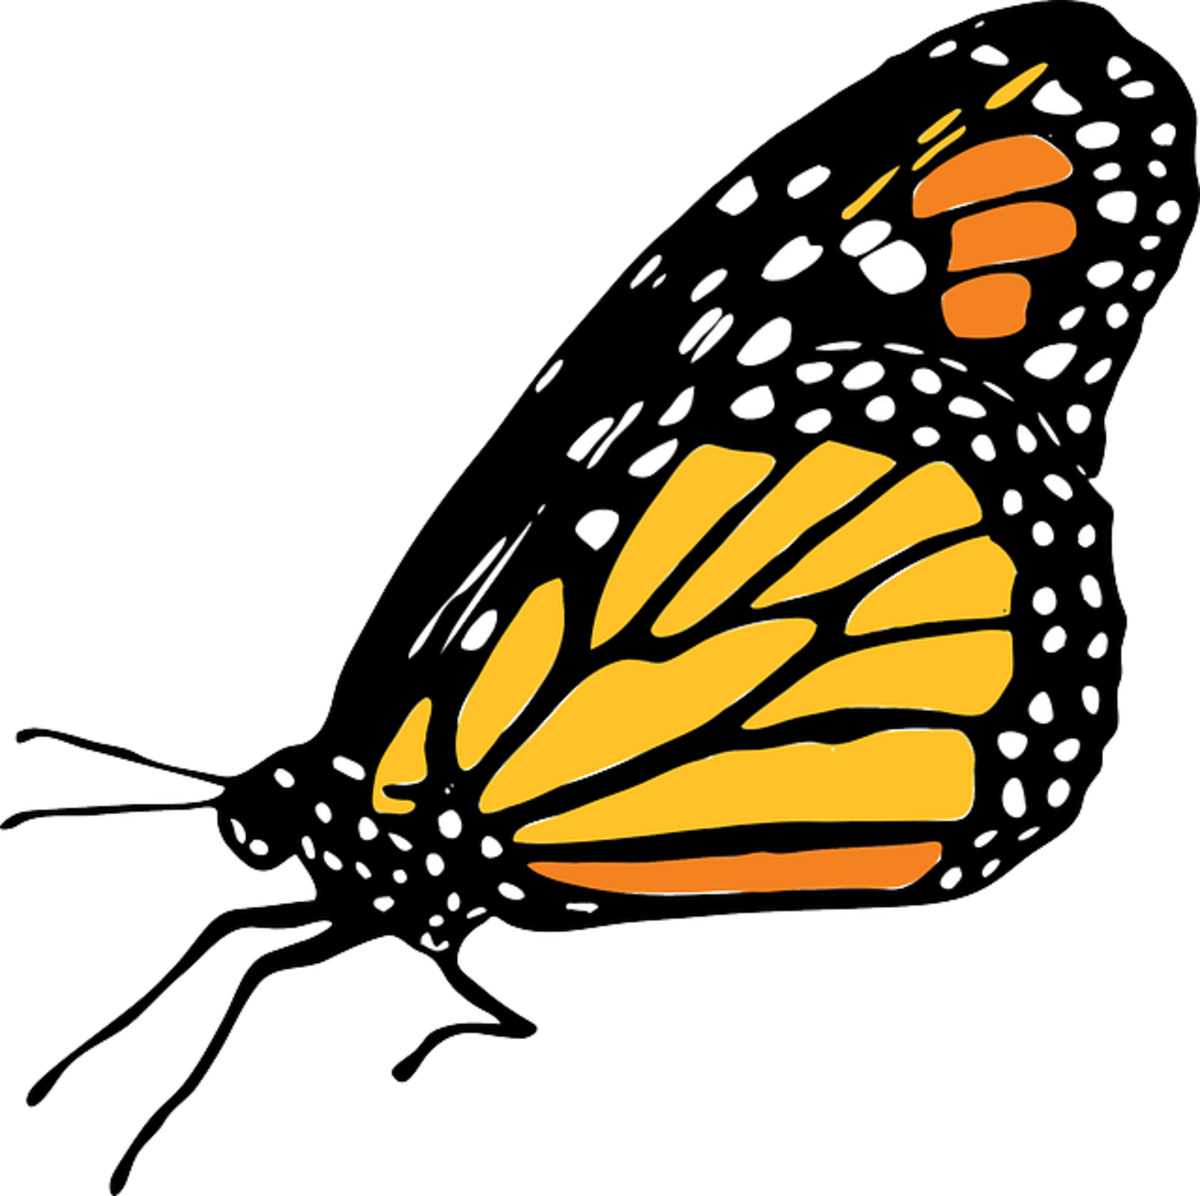 Big Monarch Butterfly